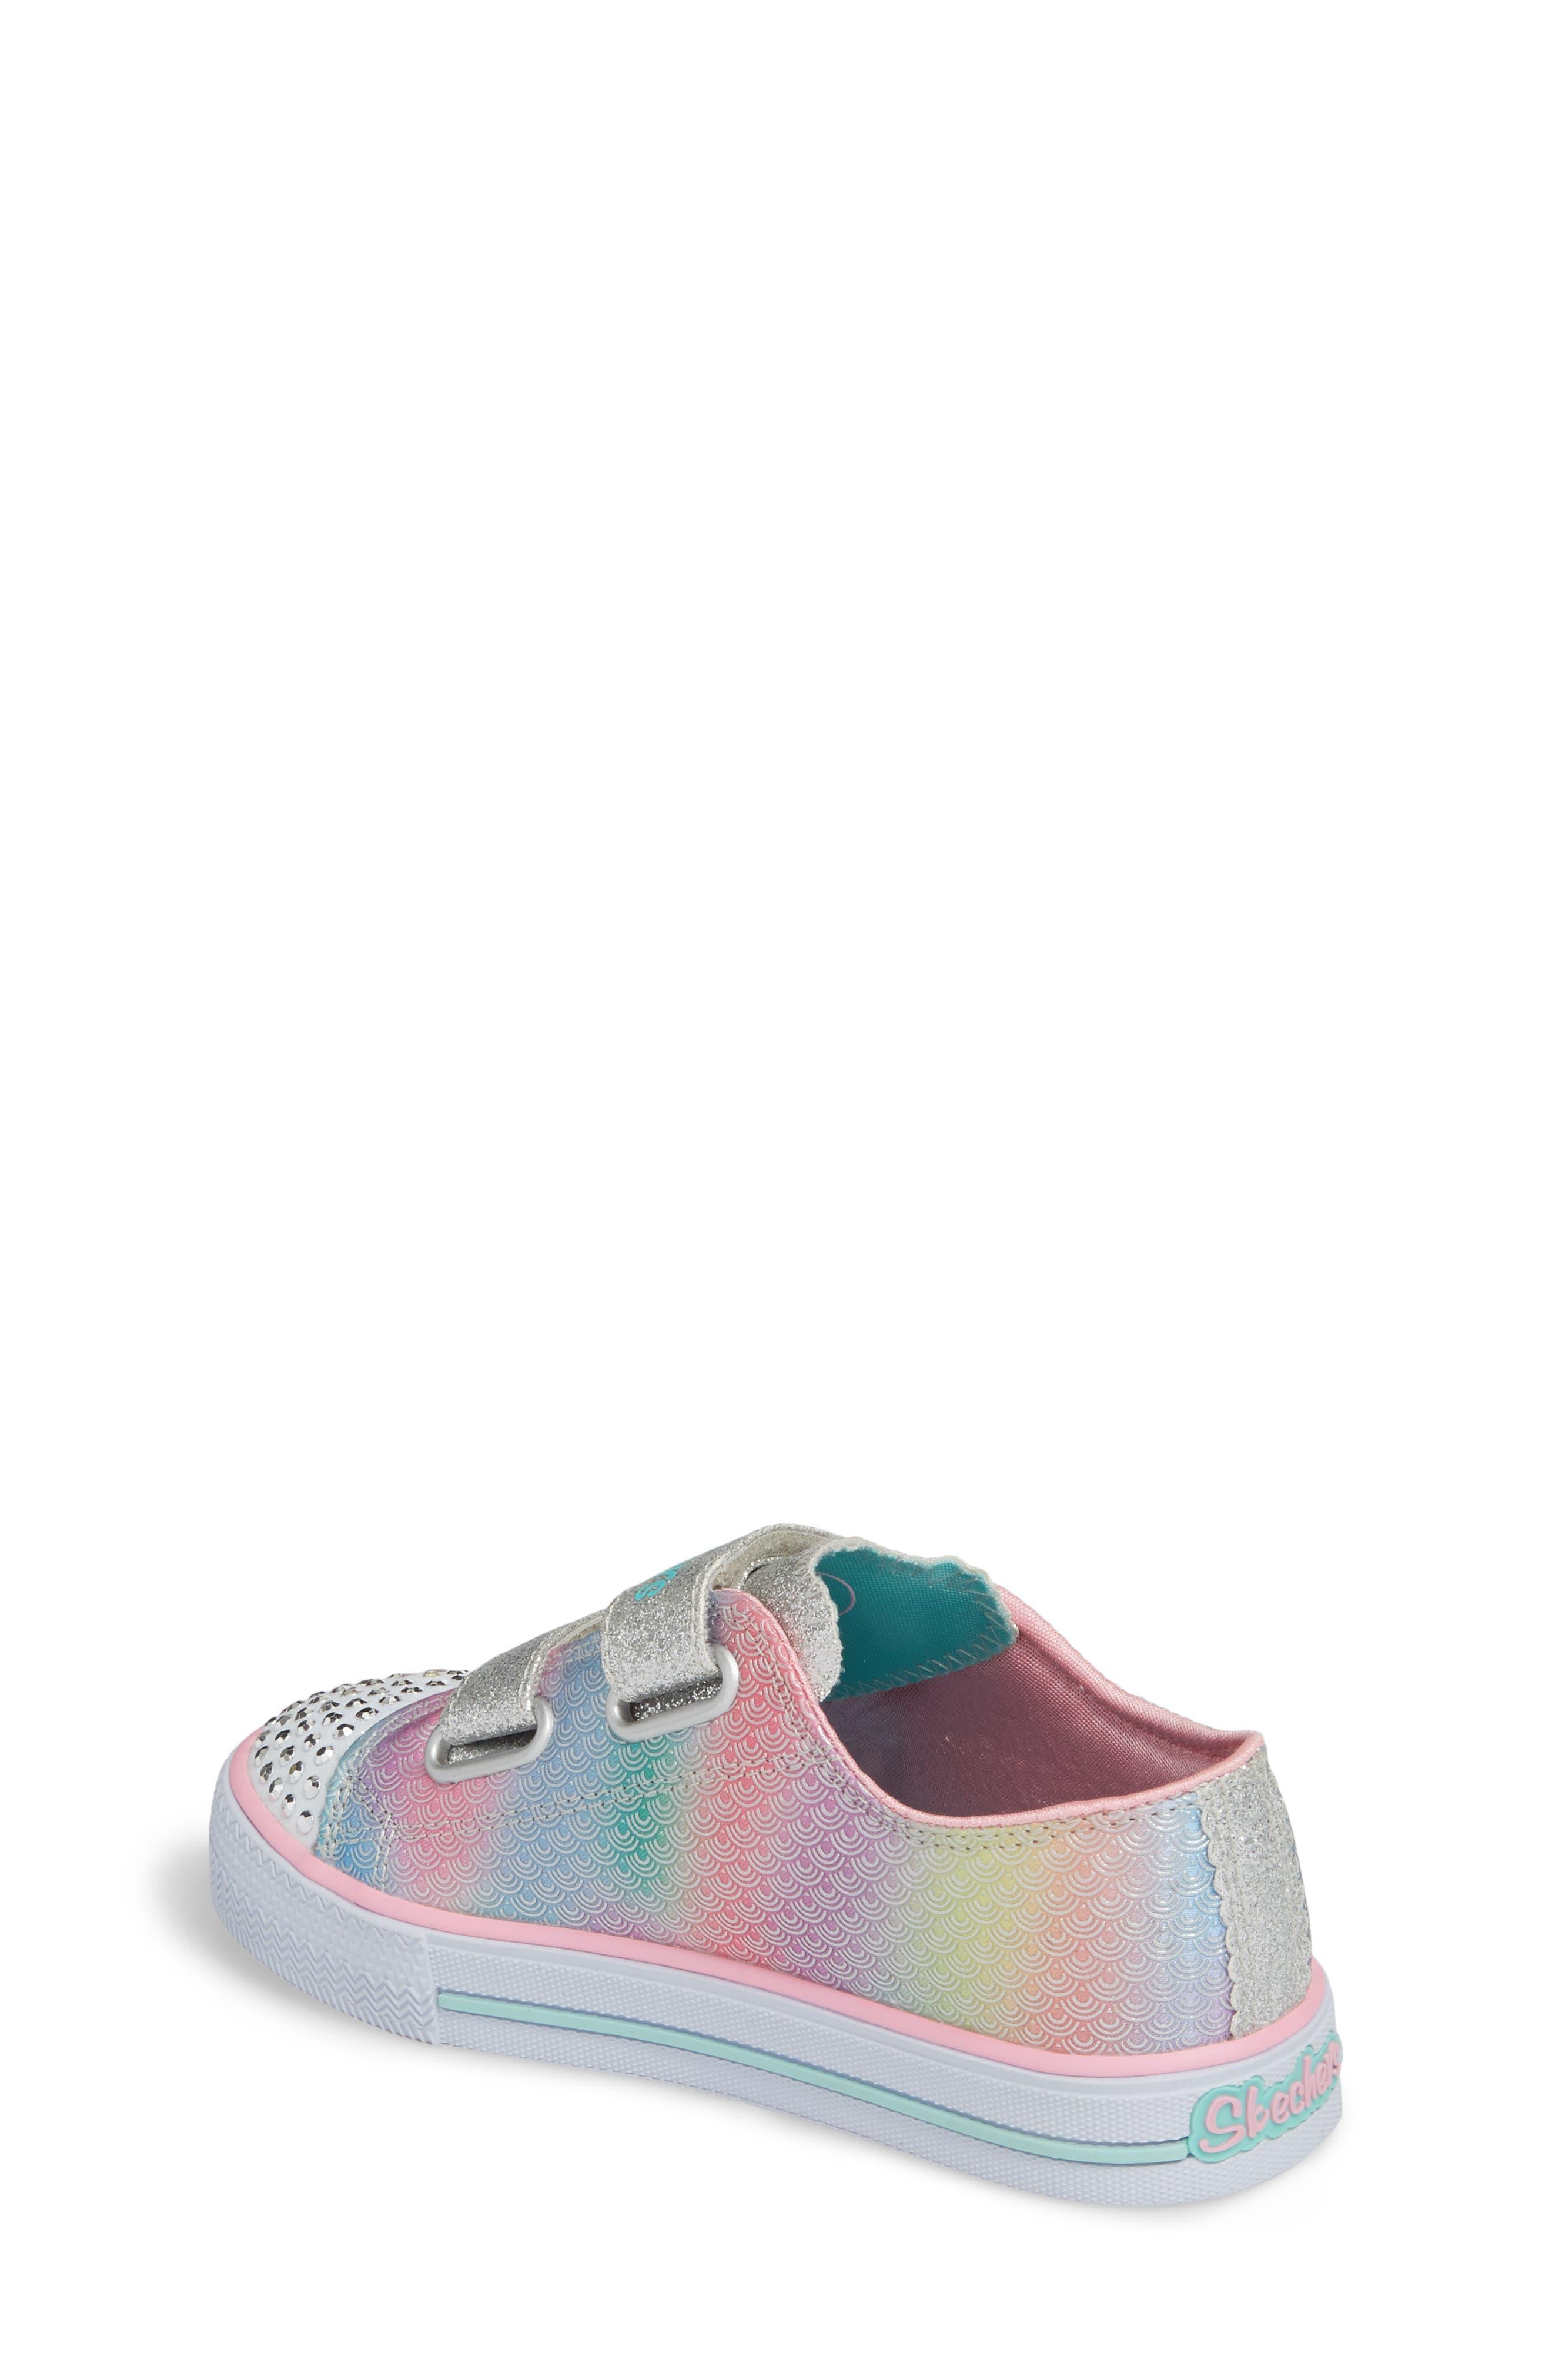 Shuffles - Itsy Bitsy Light-Up Sneaker,                             Alternate thumbnail 2, color,                             Silver/ Multi